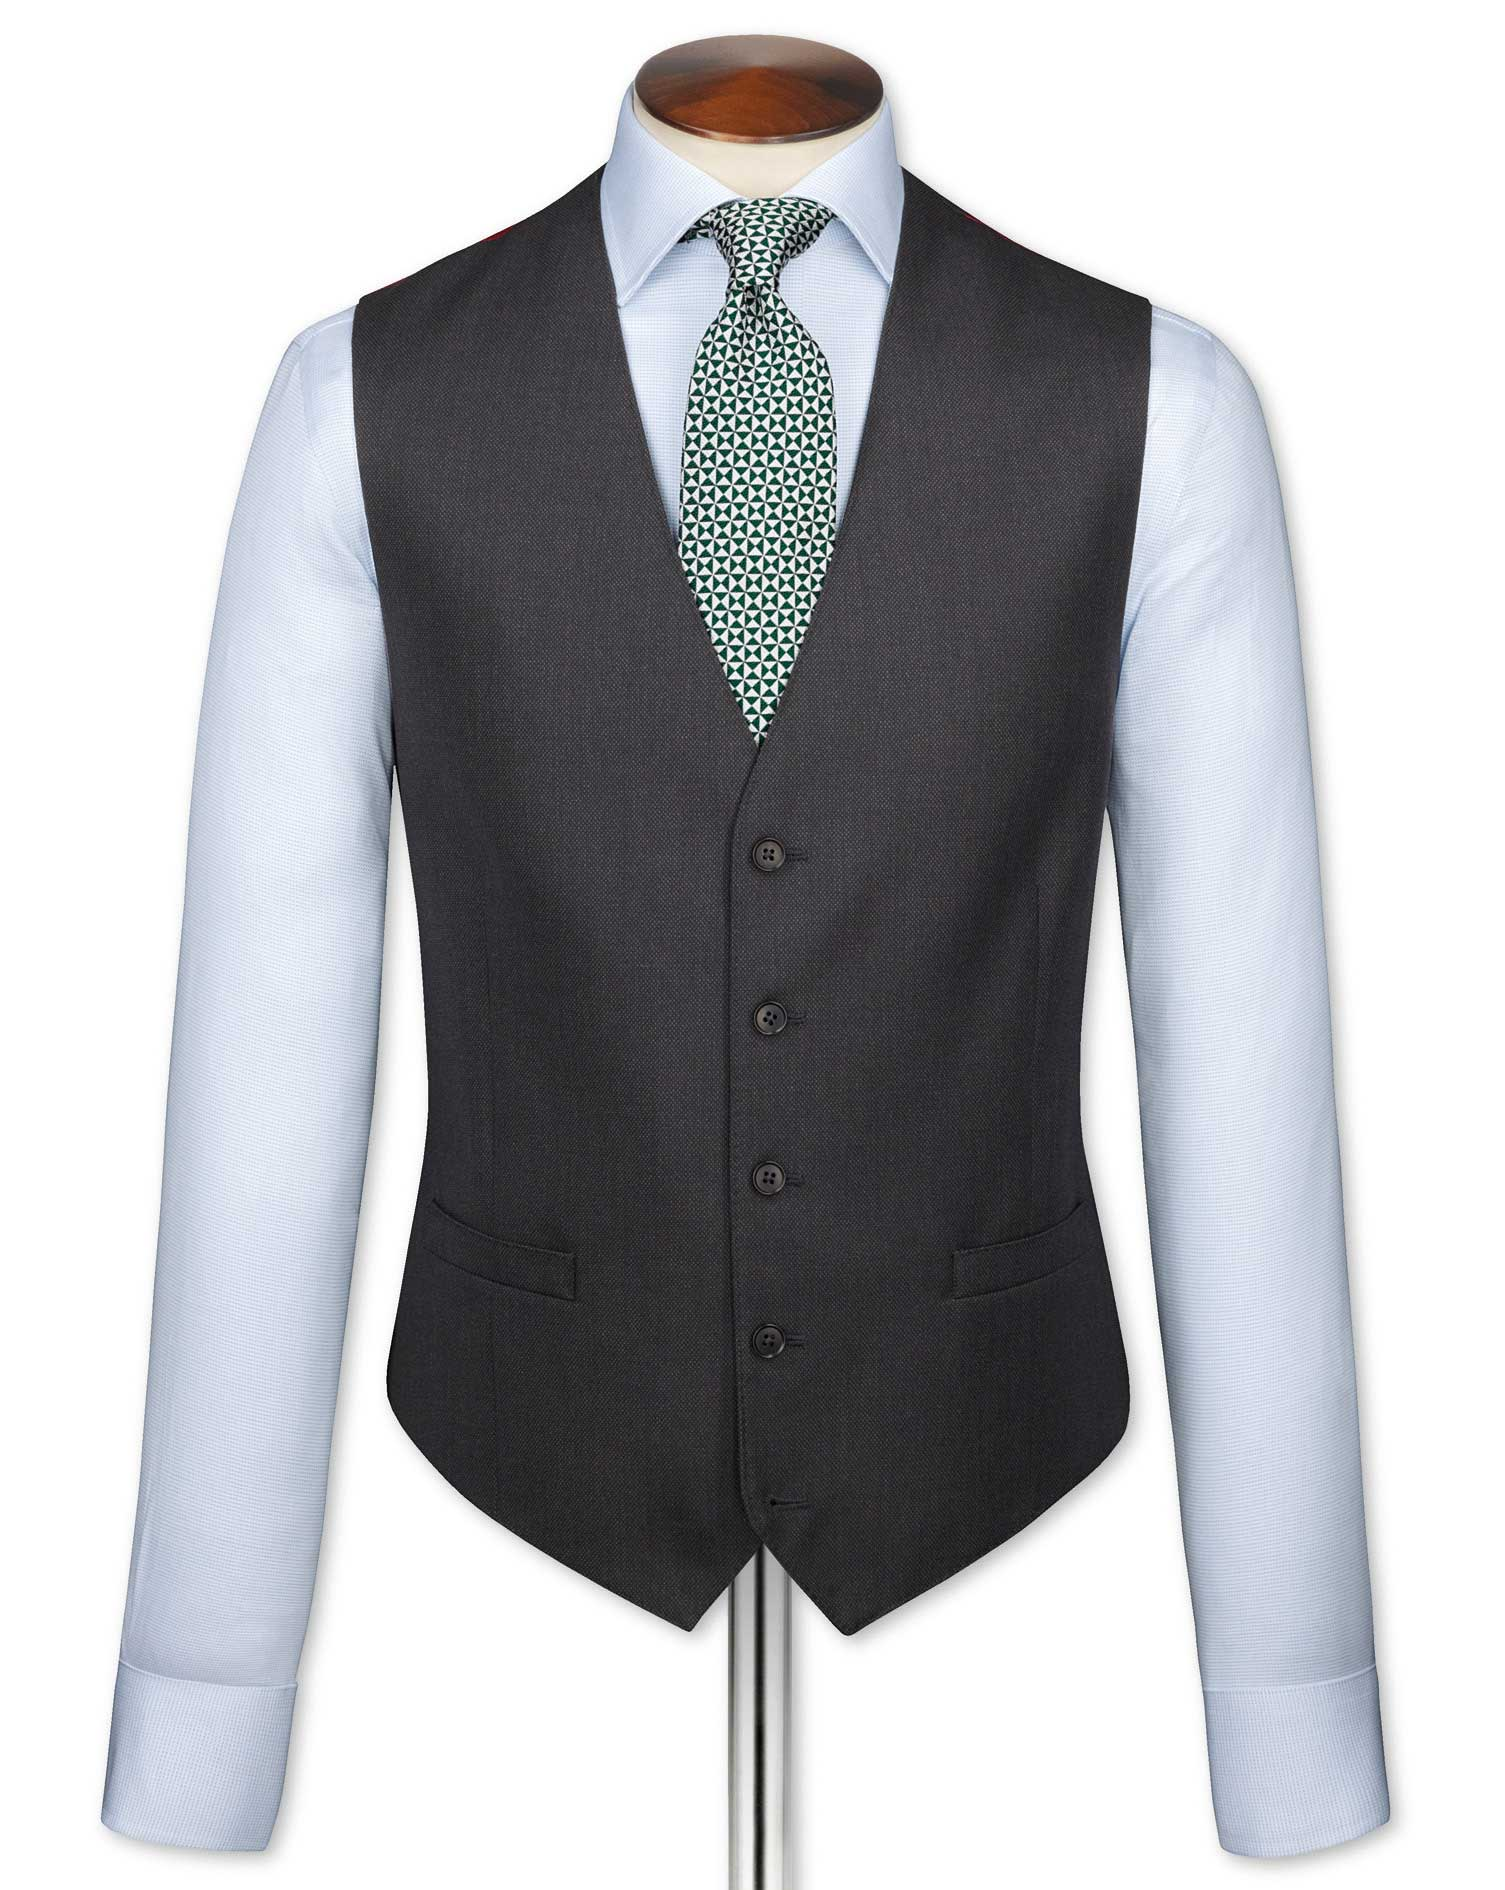 Charcoal Adjustable Fit Birdseye Travel Suit Wool Waistcoat Size w38 by Charles Tyrwhitt